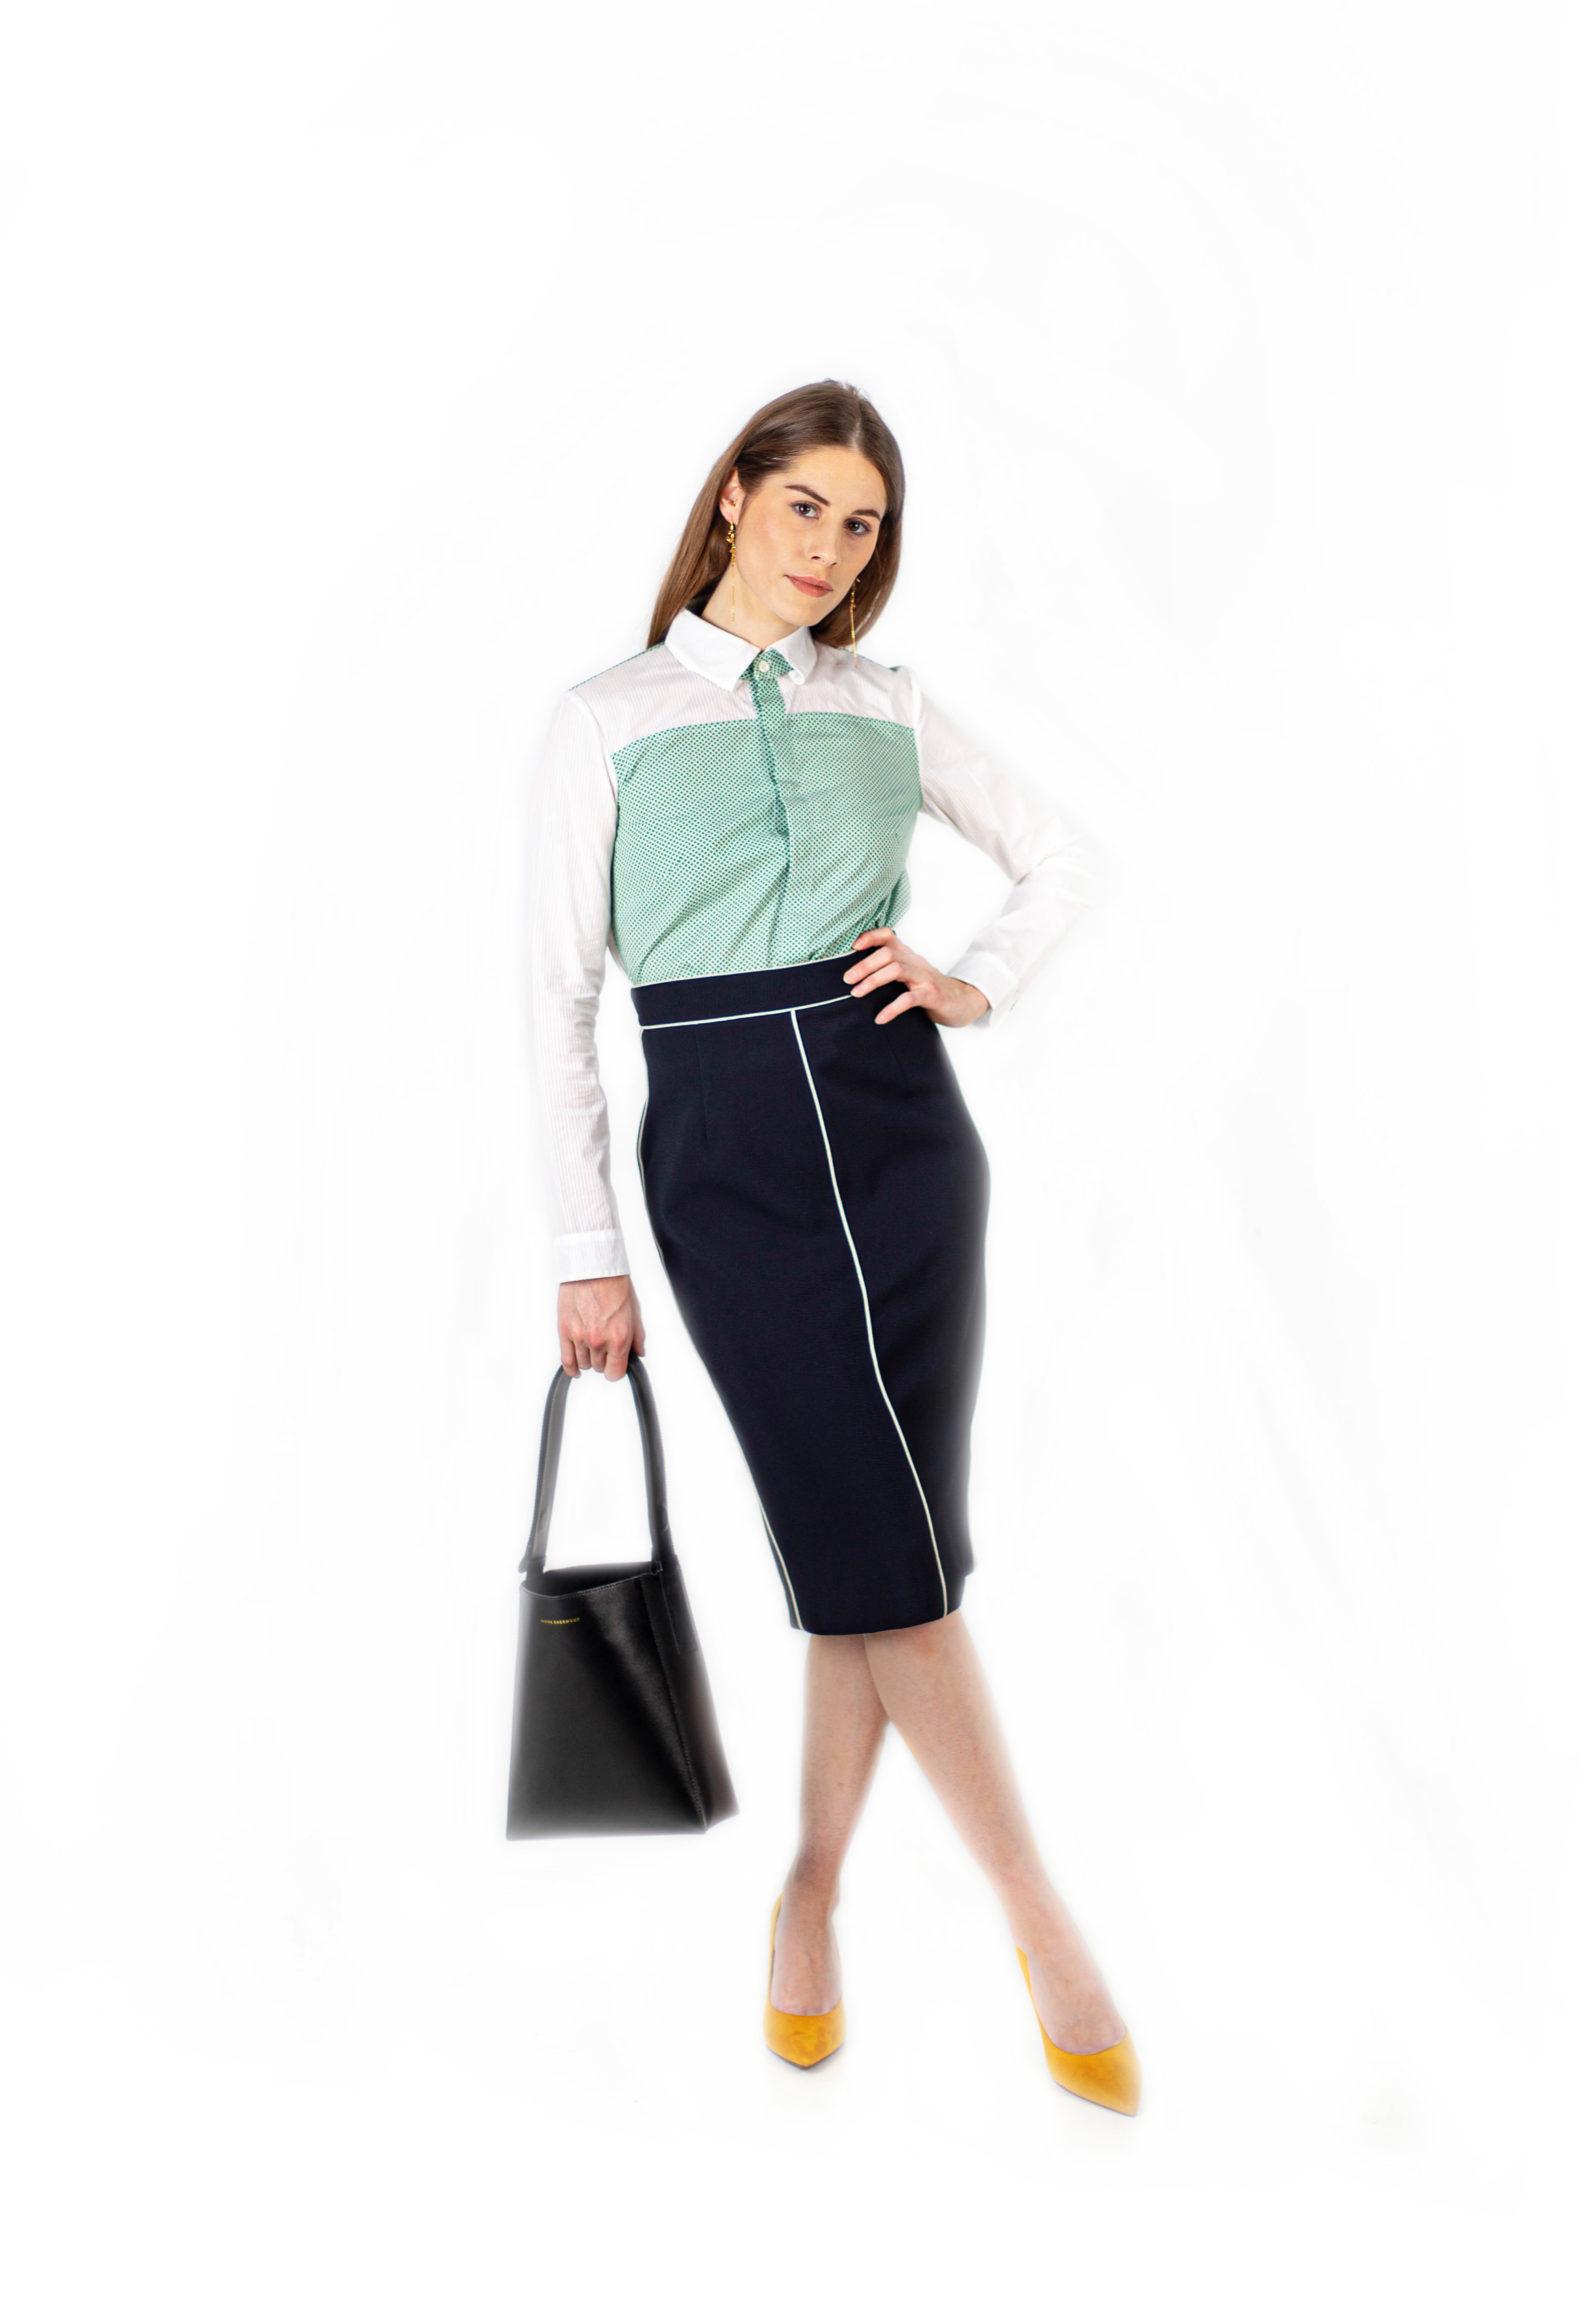 Renee bicolor green shirt-Chemise Renee Verte-1-chemise-femme-bicolore-affaires-etrangeres-camille-wagner